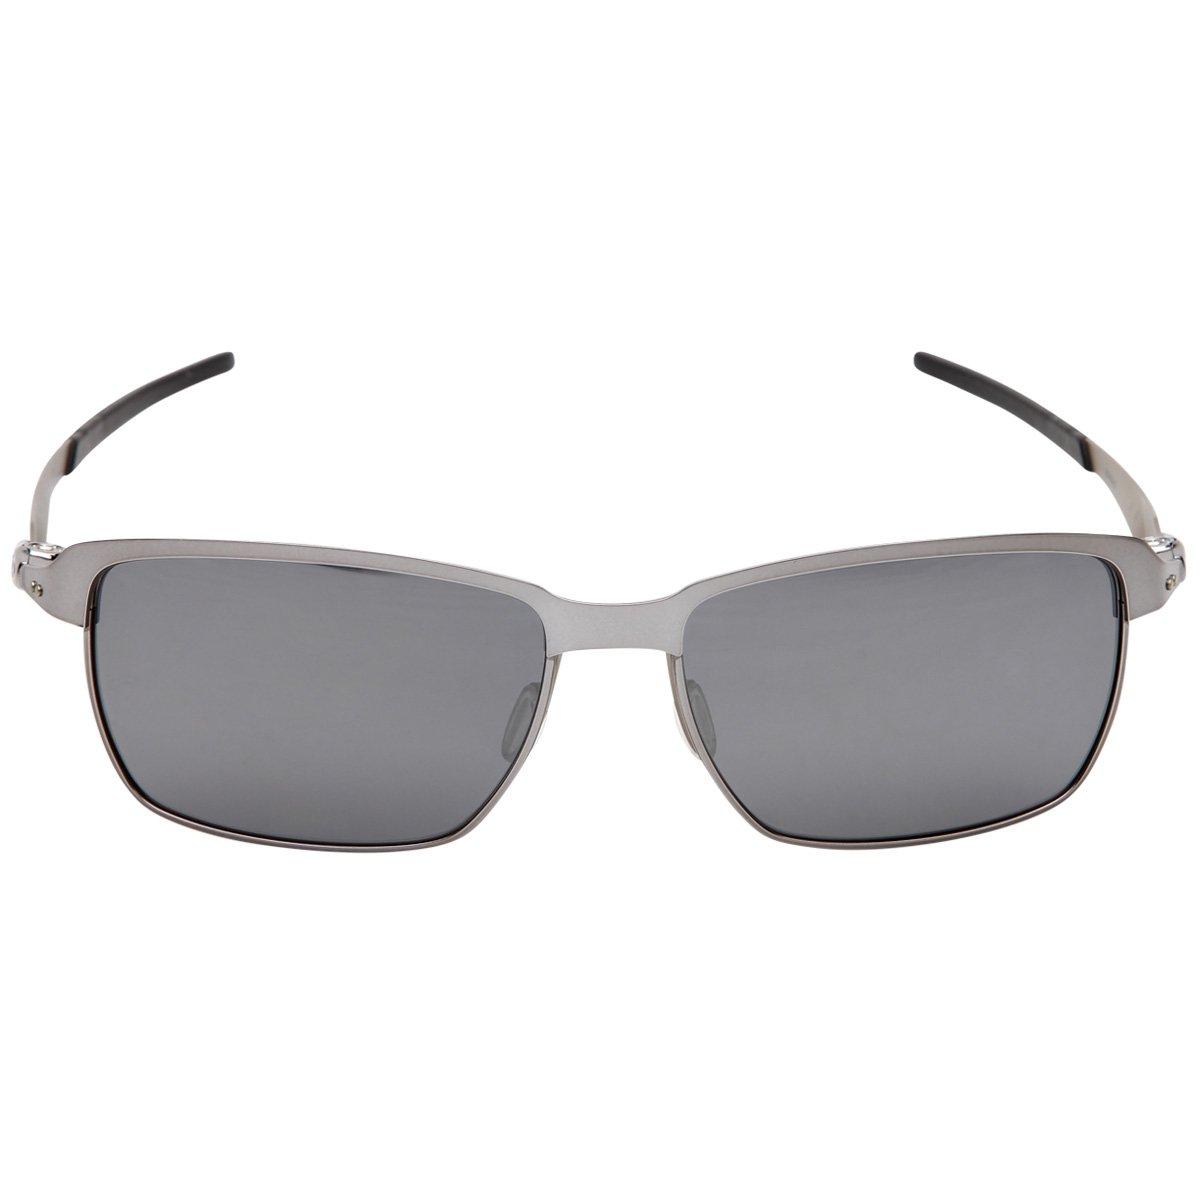 3f83f6c0c2a9d Óculos Oakley Tinfoil - Iridium - Compre Agora   Netshoes